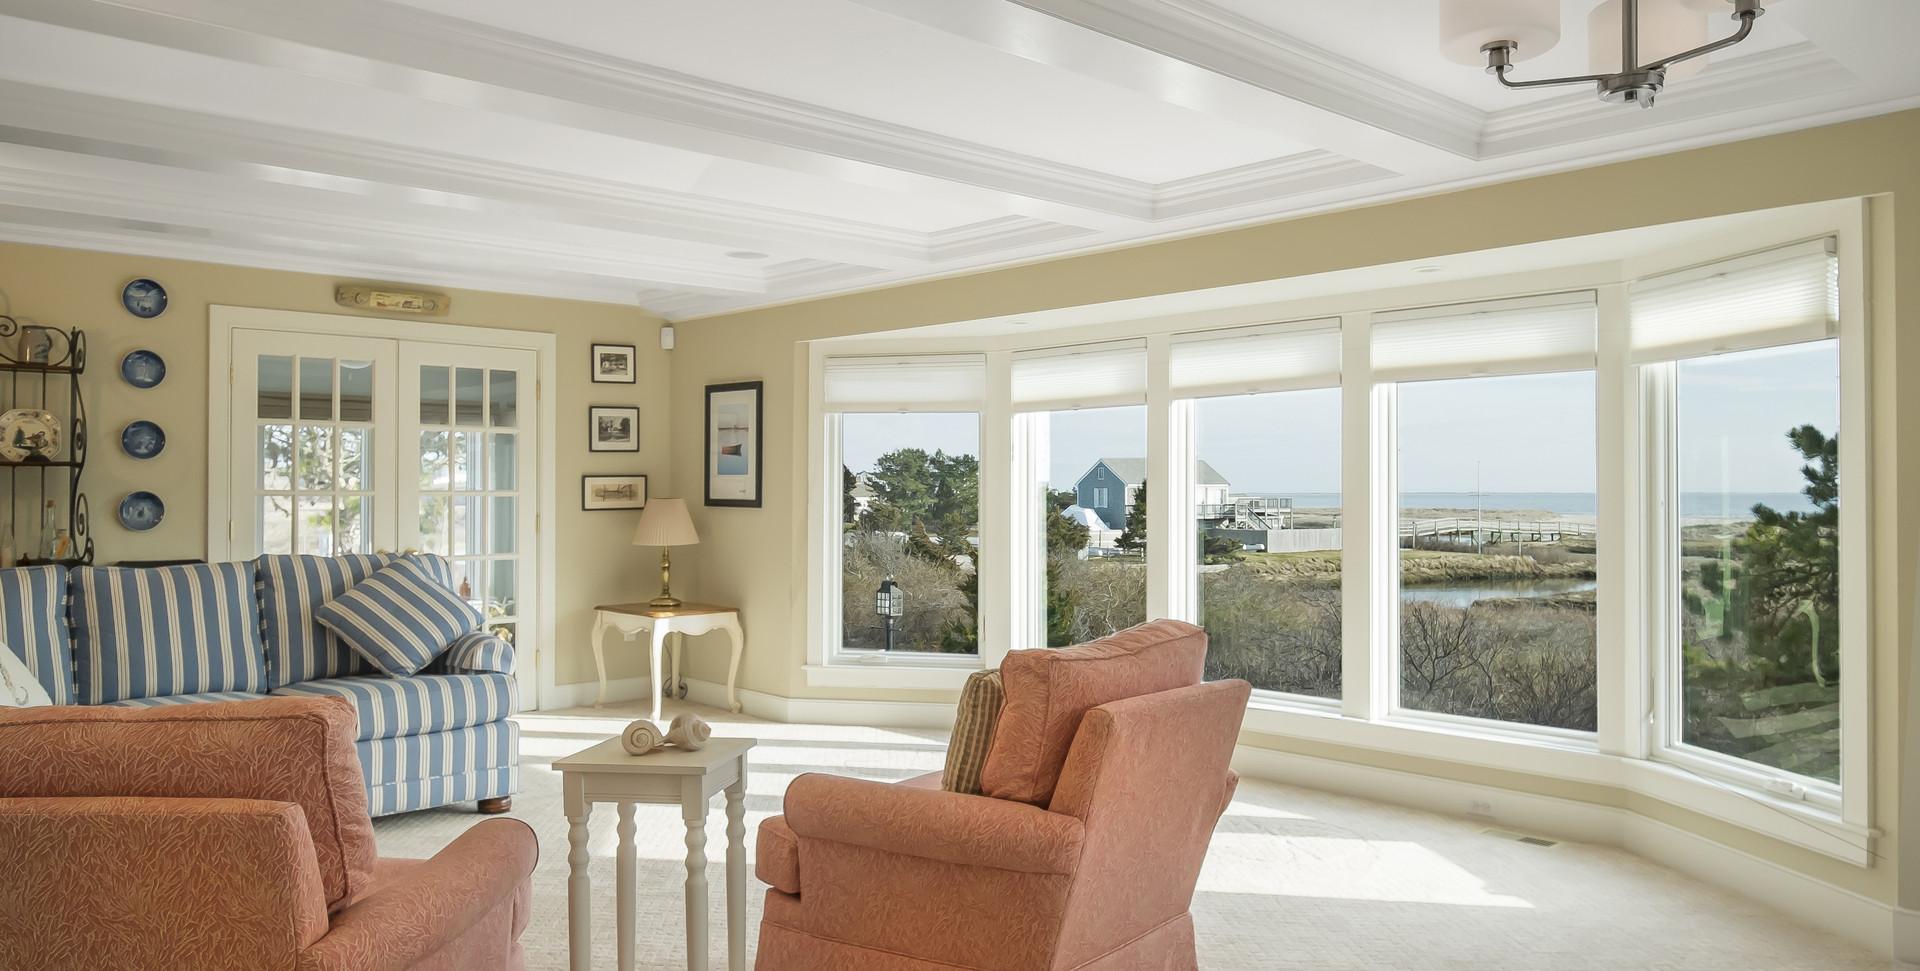 Ridgevale Beach, West Chatham, MA, Home Remodel, Cape Cod living room